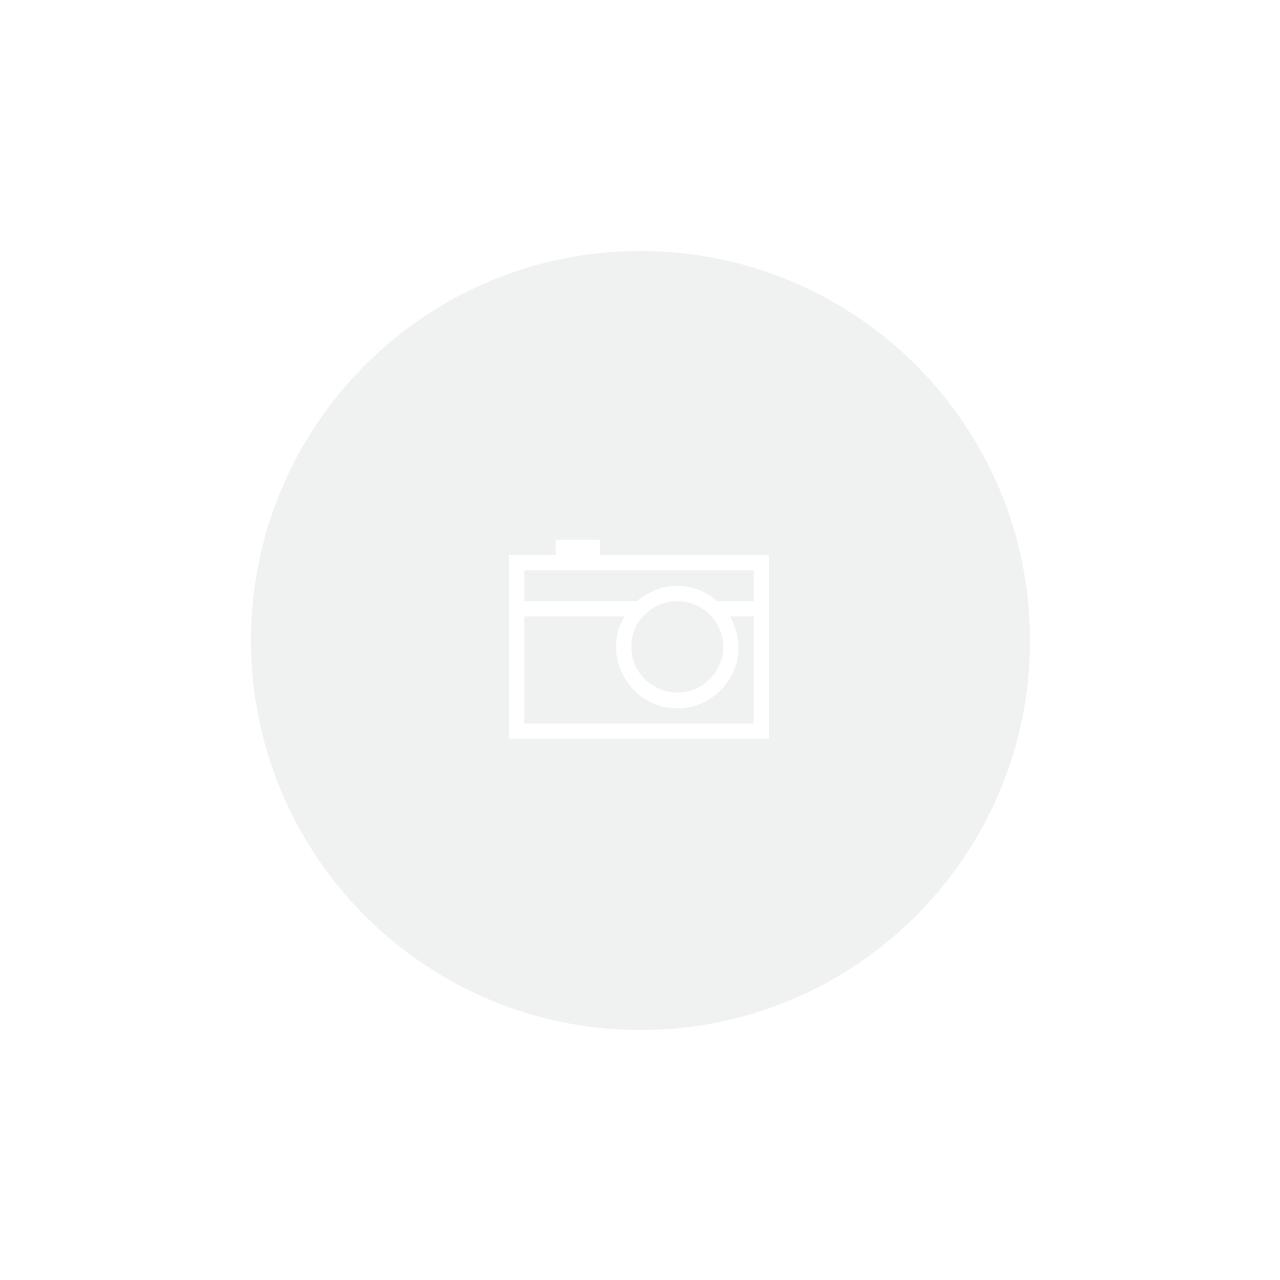 Kit Banho & Tosa Completo - 42 Itens